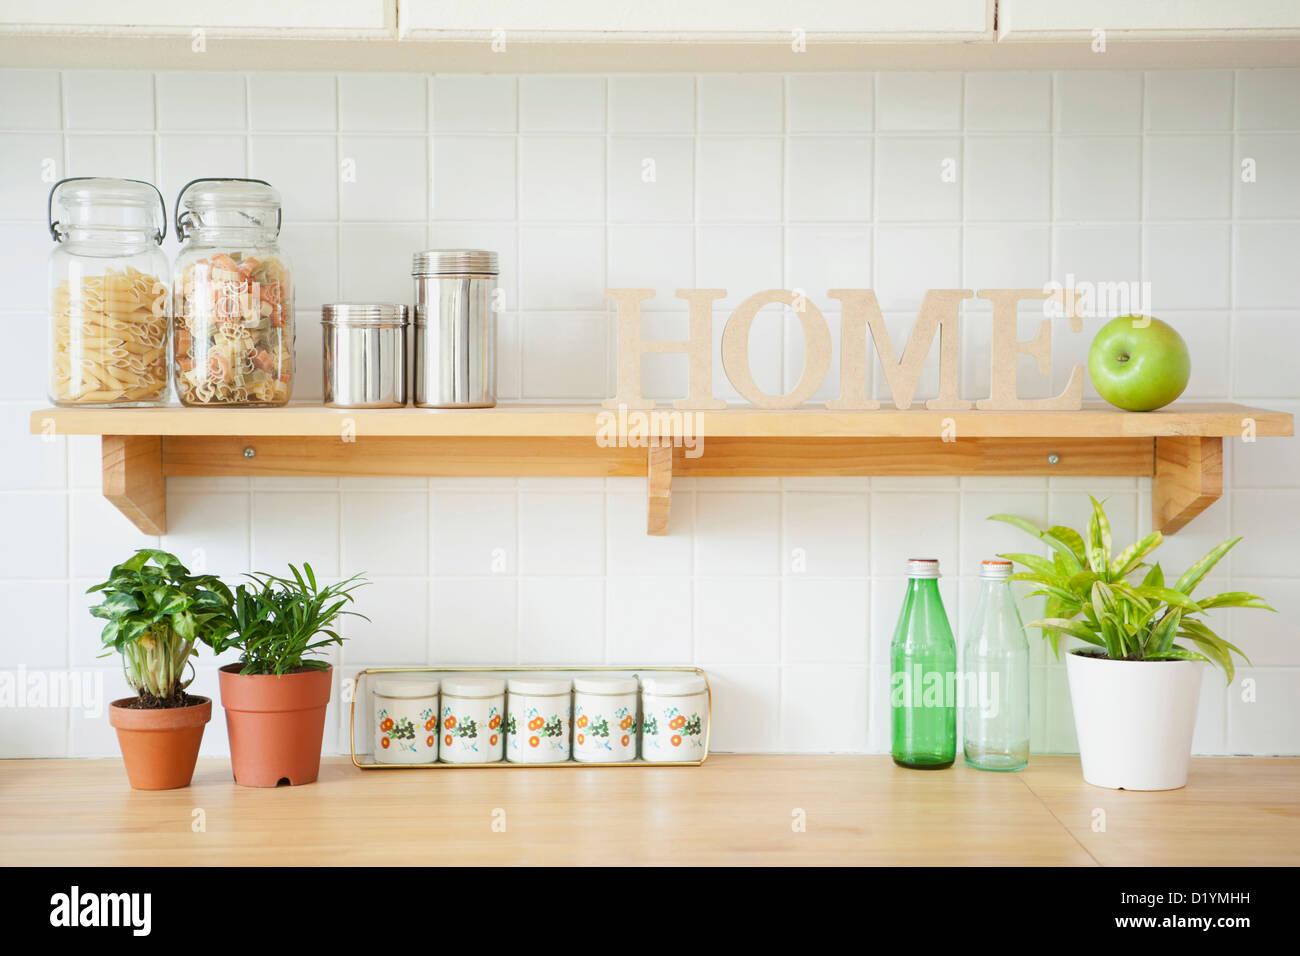 pasta rack stockfotos pasta rack bilder alamy. Black Bedroom Furniture Sets. Home Design Ideas